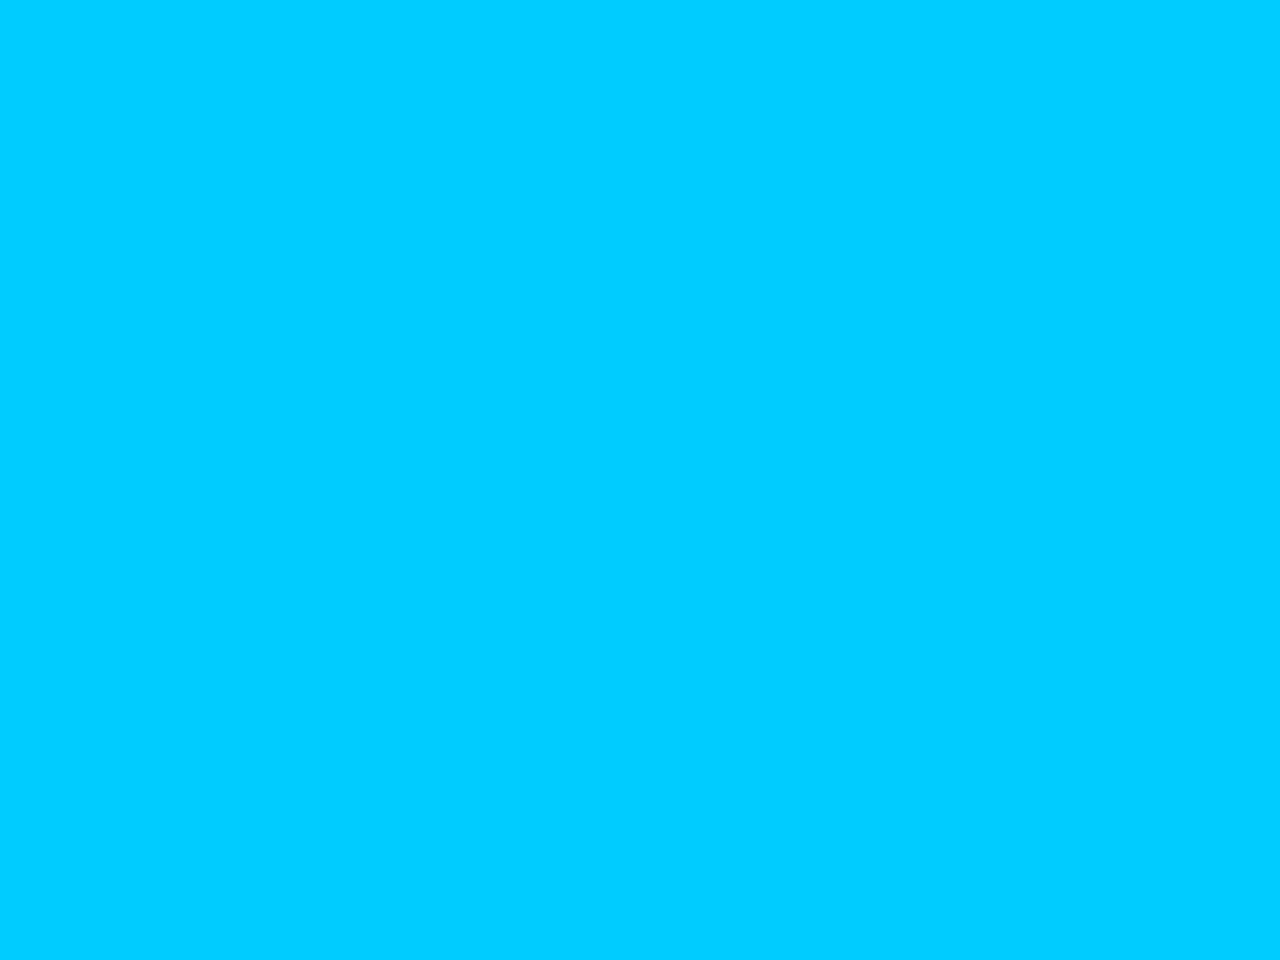 1280x960 Vivid Sky Blue Solid Color Background